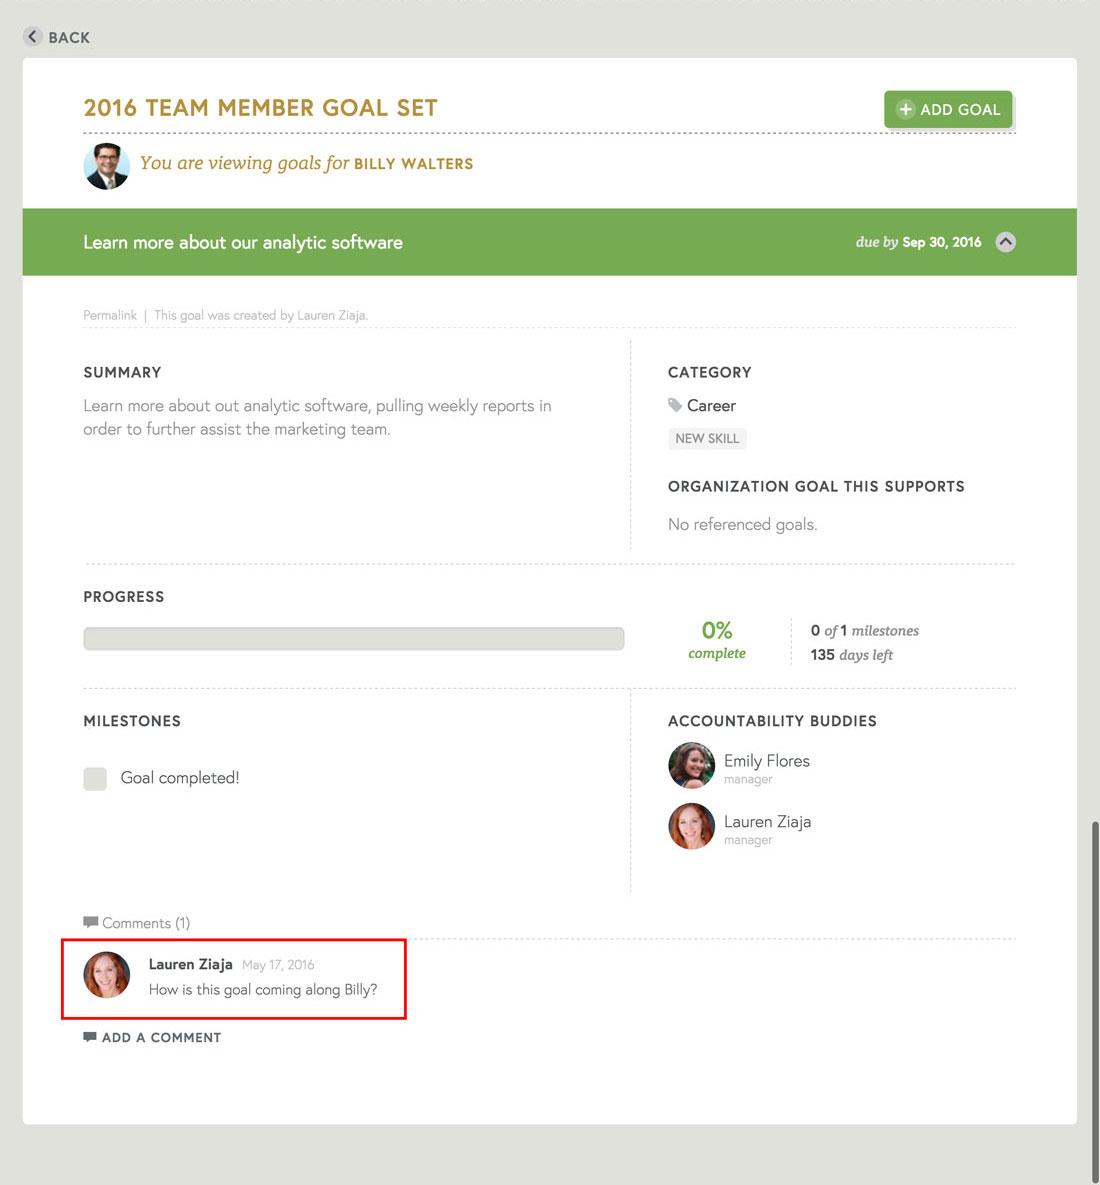 using employee engagement platform for employee communication on goals and goal setting